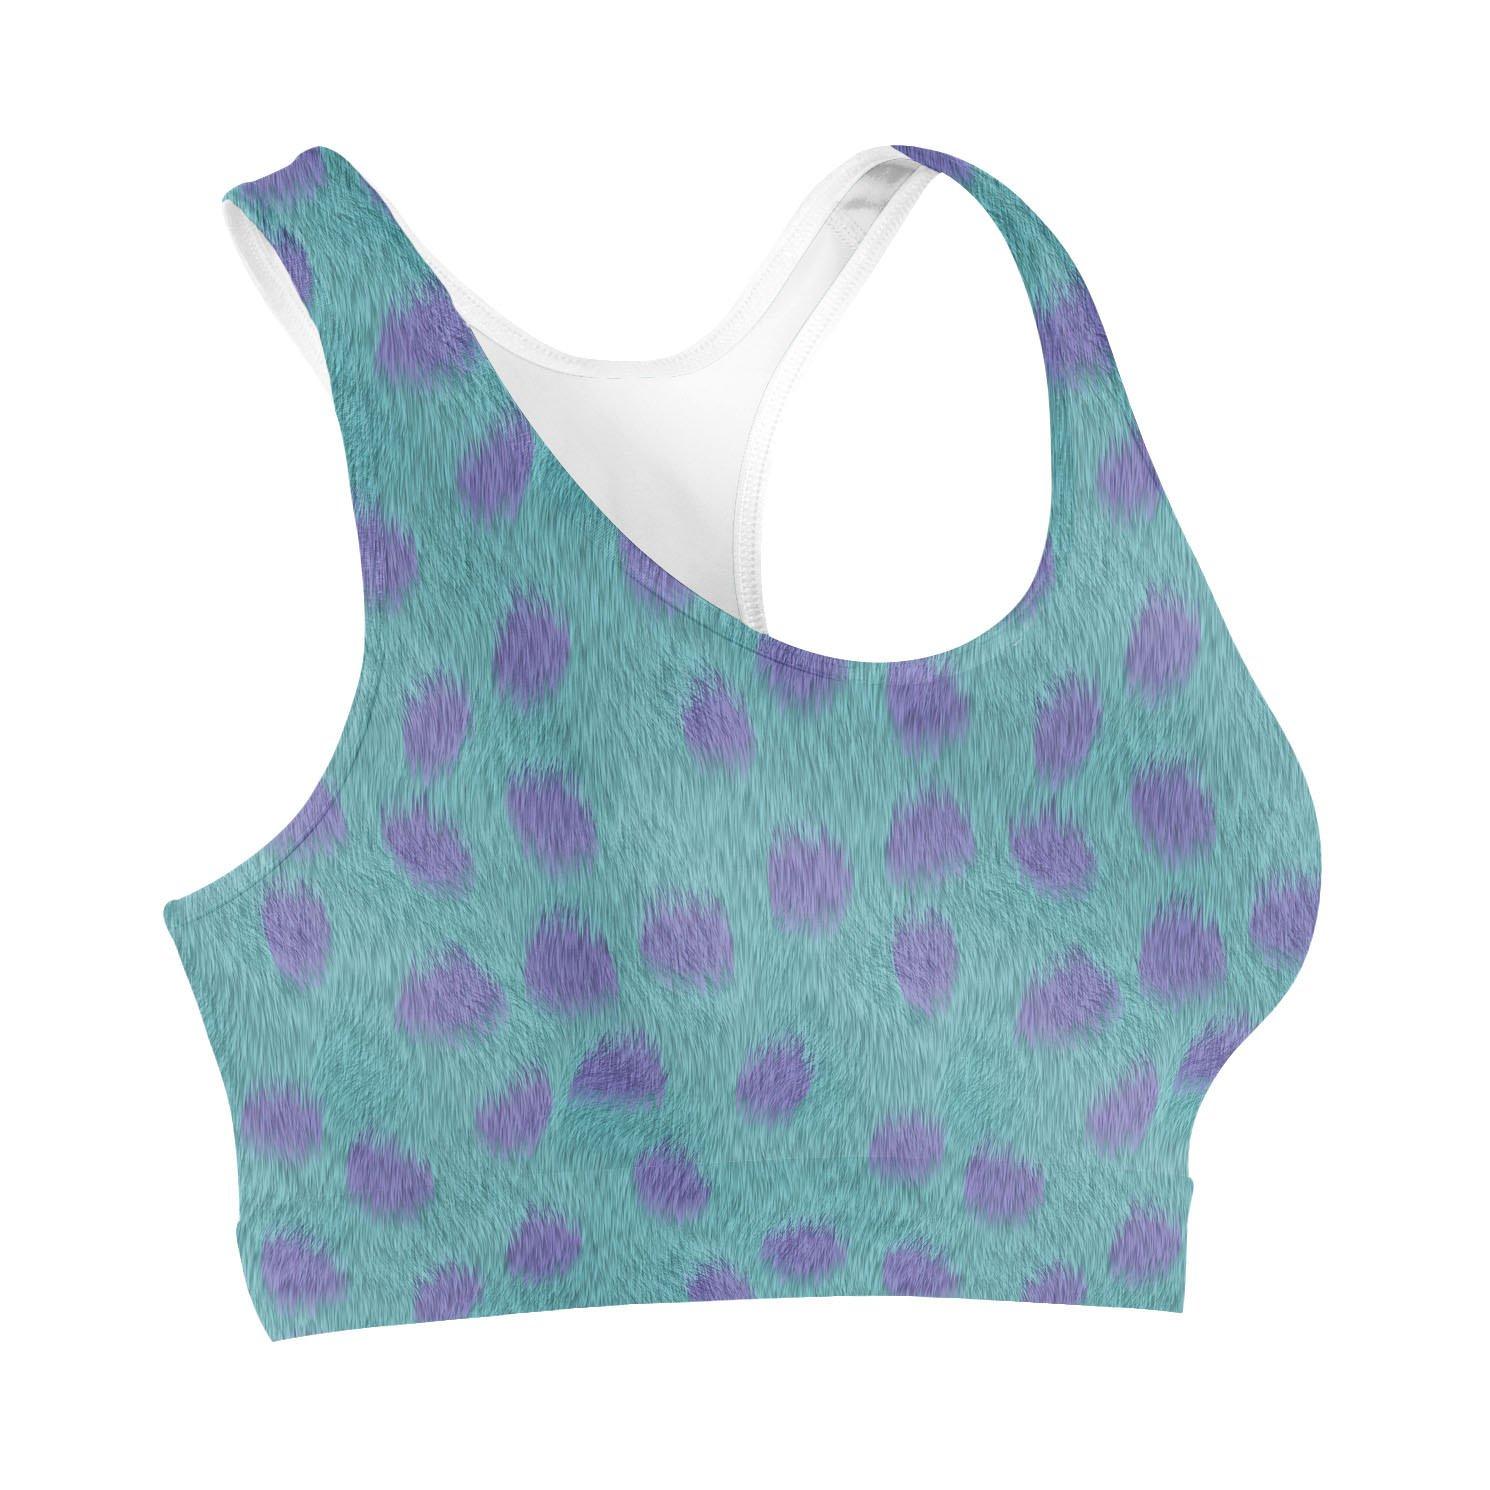 Lkegc Womens Seamless Pattern sea Icons Fashion Printed Sports Yoga Seamless Yoga Running Bra